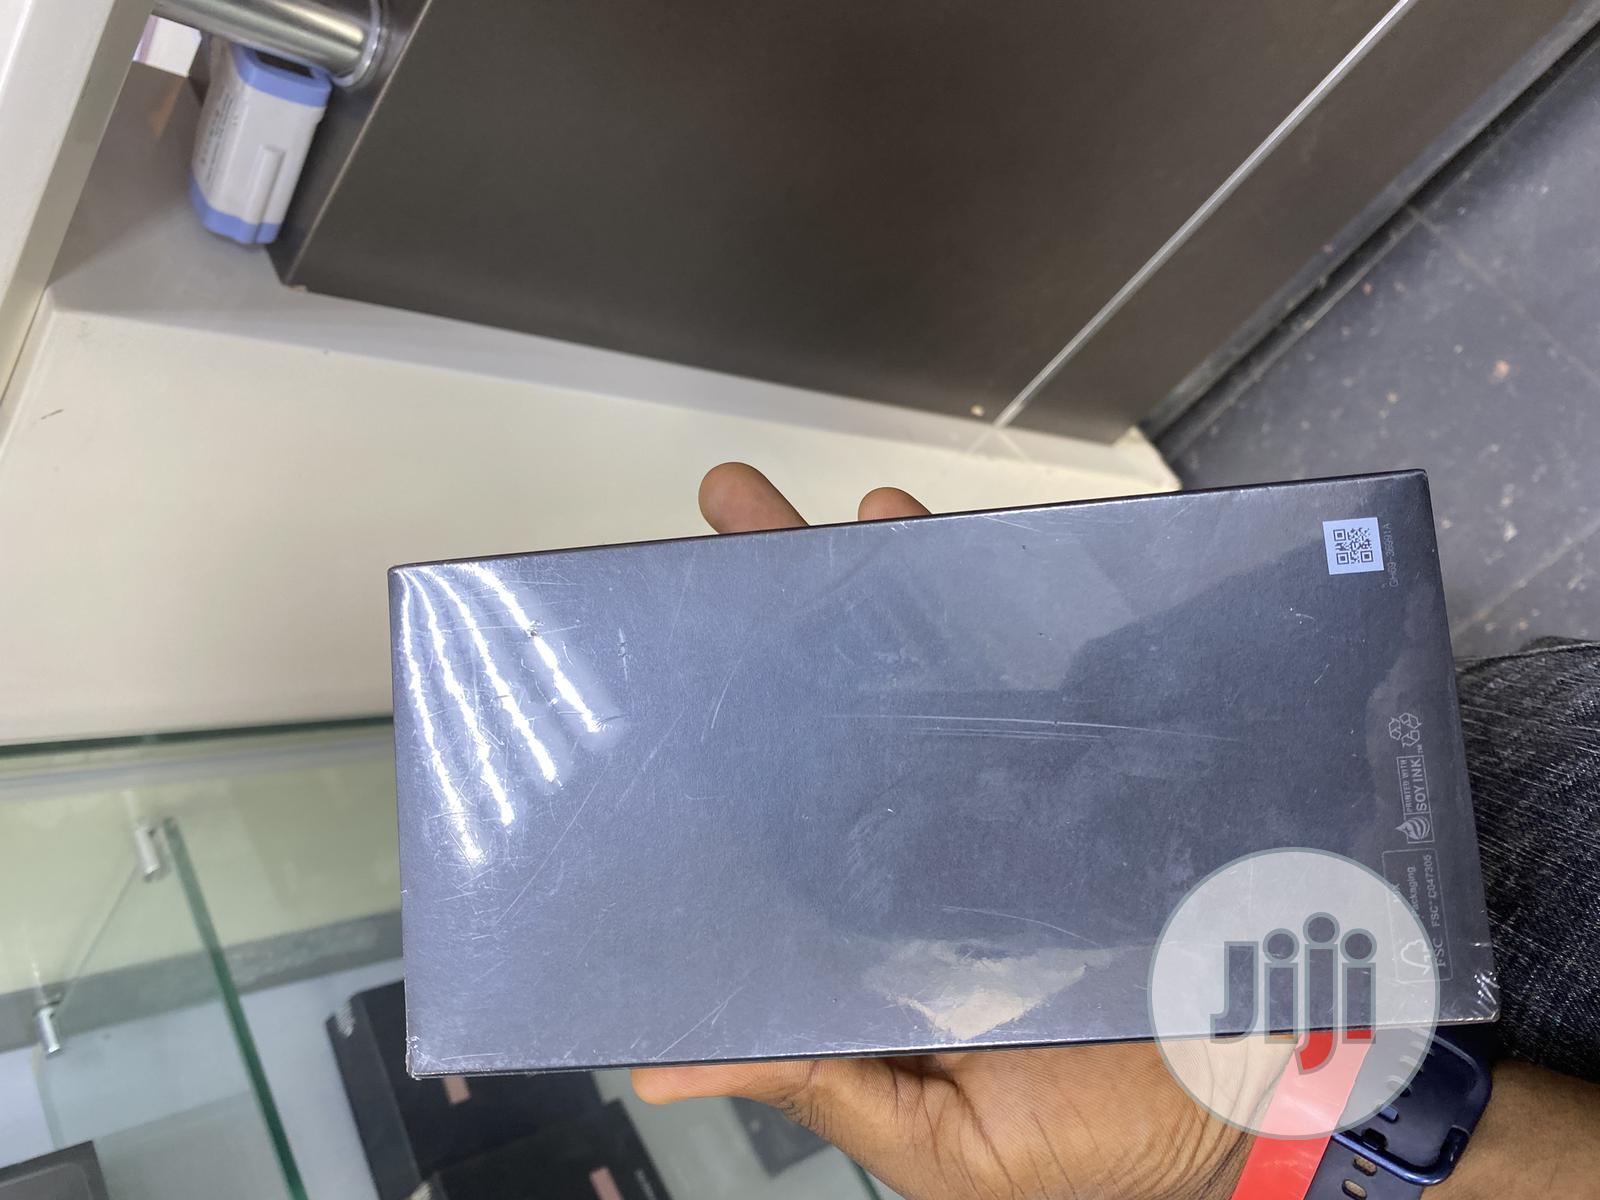 New Samsung Galaxy Z Flip 256 GB Black   Mobile Phones for sale in Ikeja, Lagos State, Nigeria